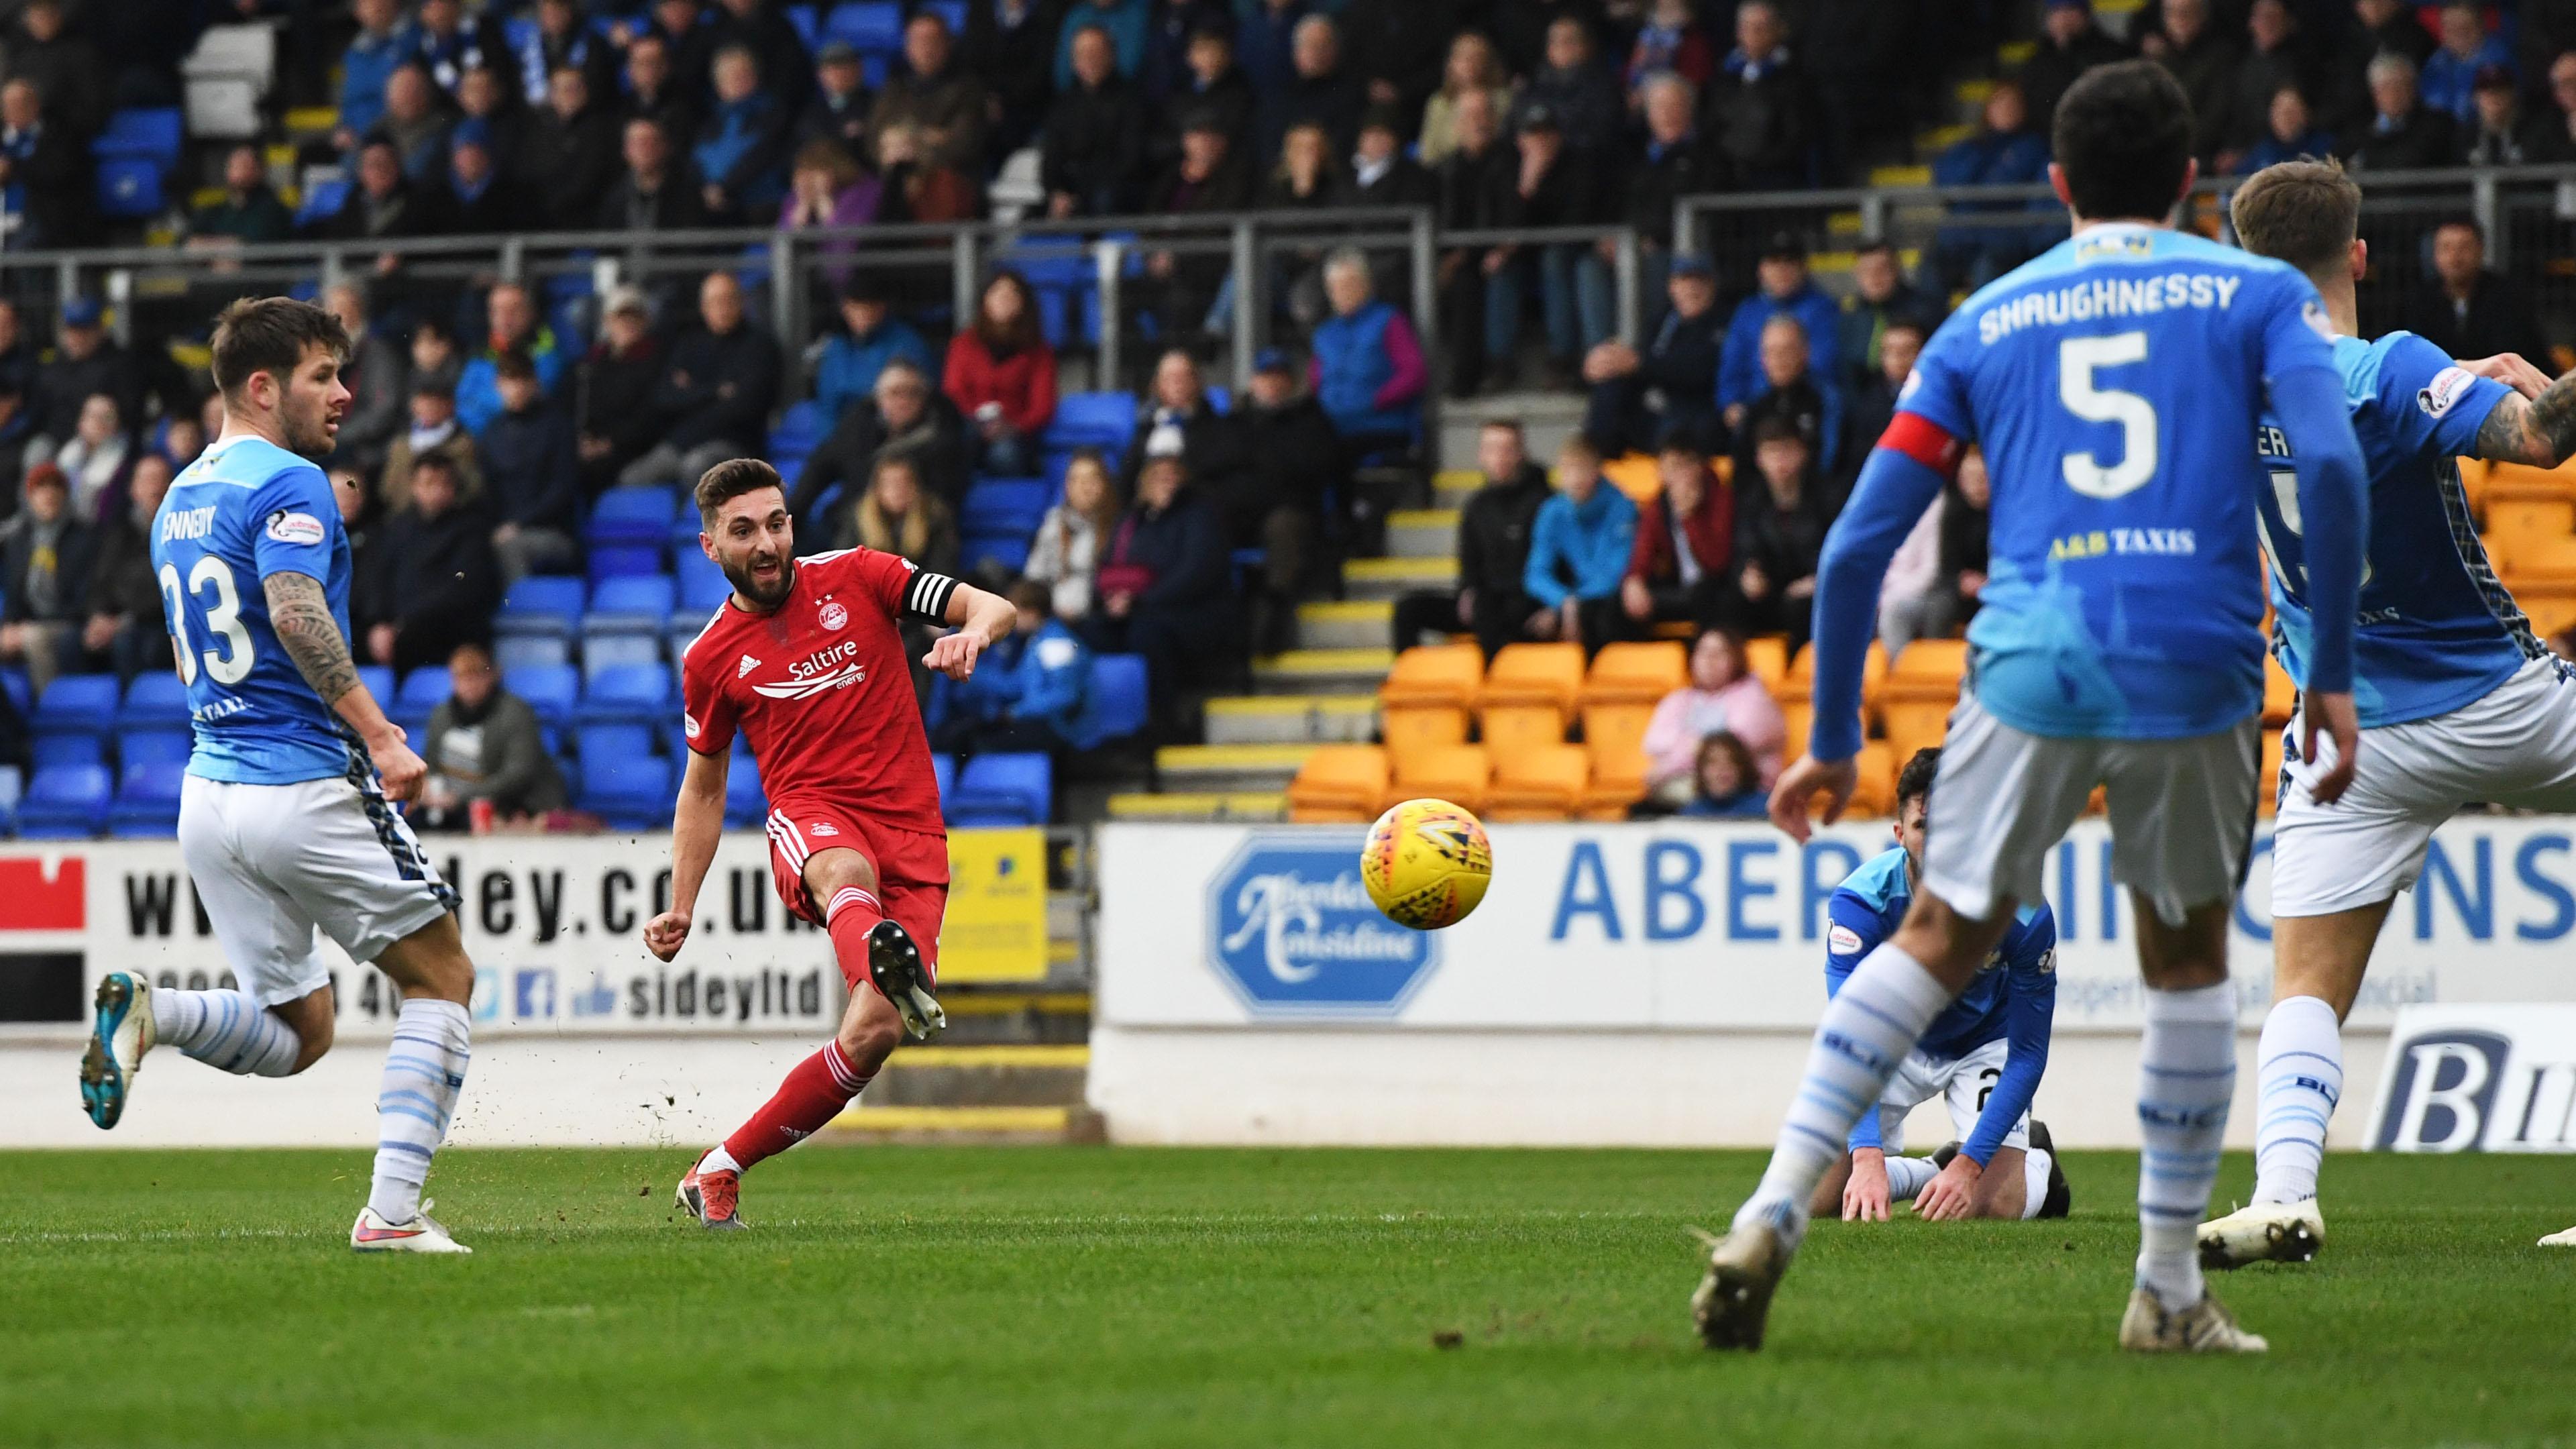 Aberdeen's Graeme Shinnie opens the scoring